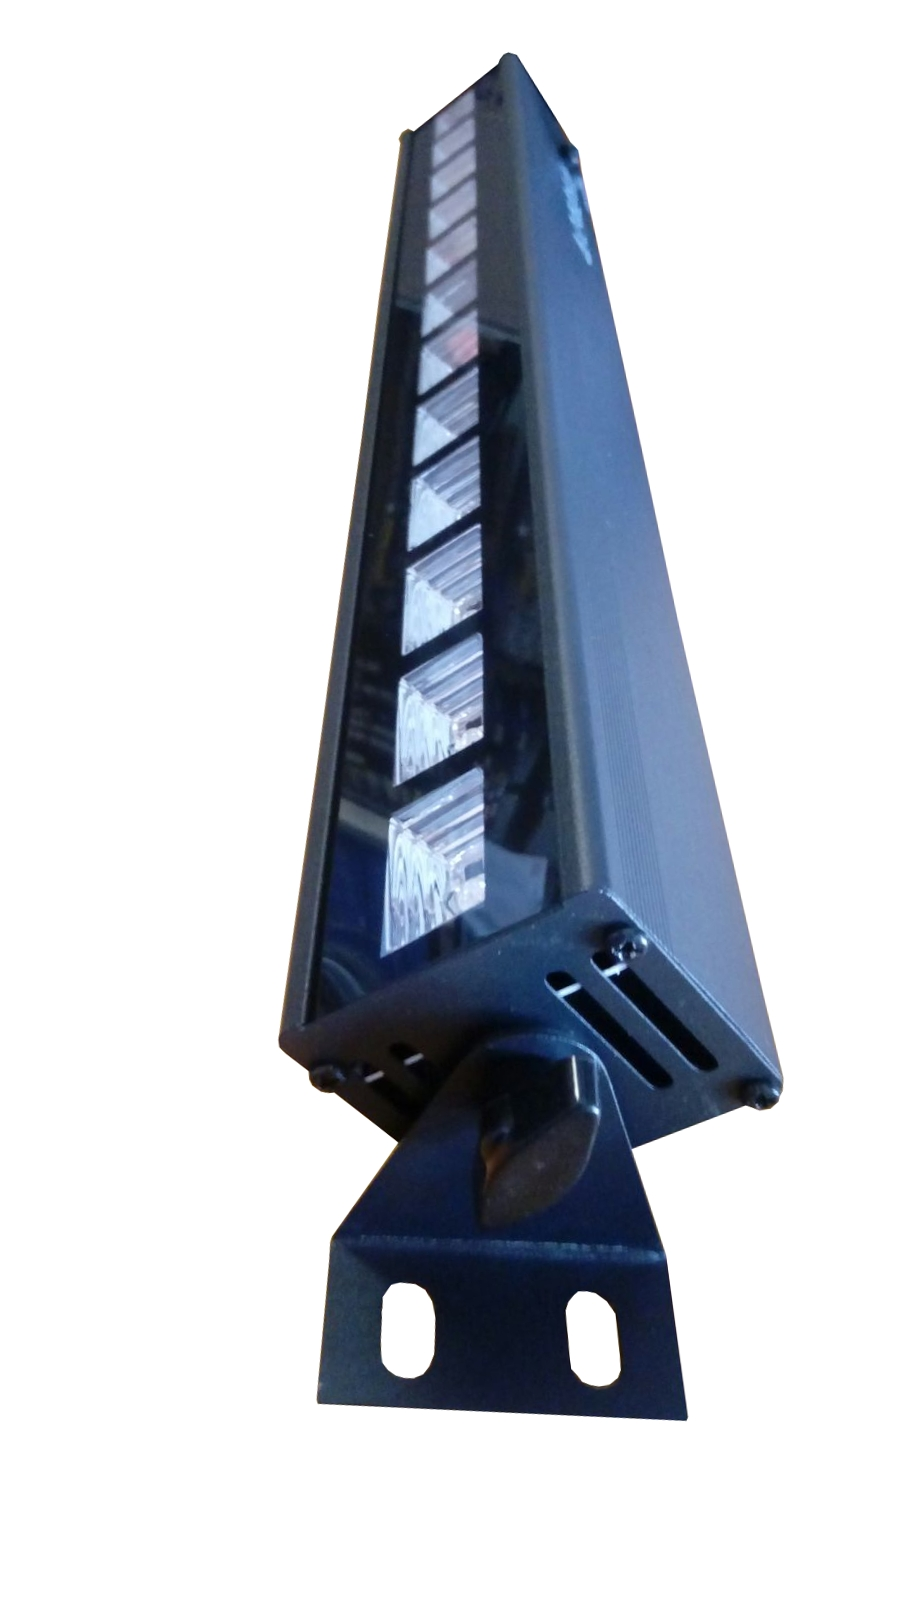 EXTREME UV LED BAR 123 BARRA LED UV 12 X 3 WATT PLUG & PLAY CON INTERRUTTORE ON OFF 1